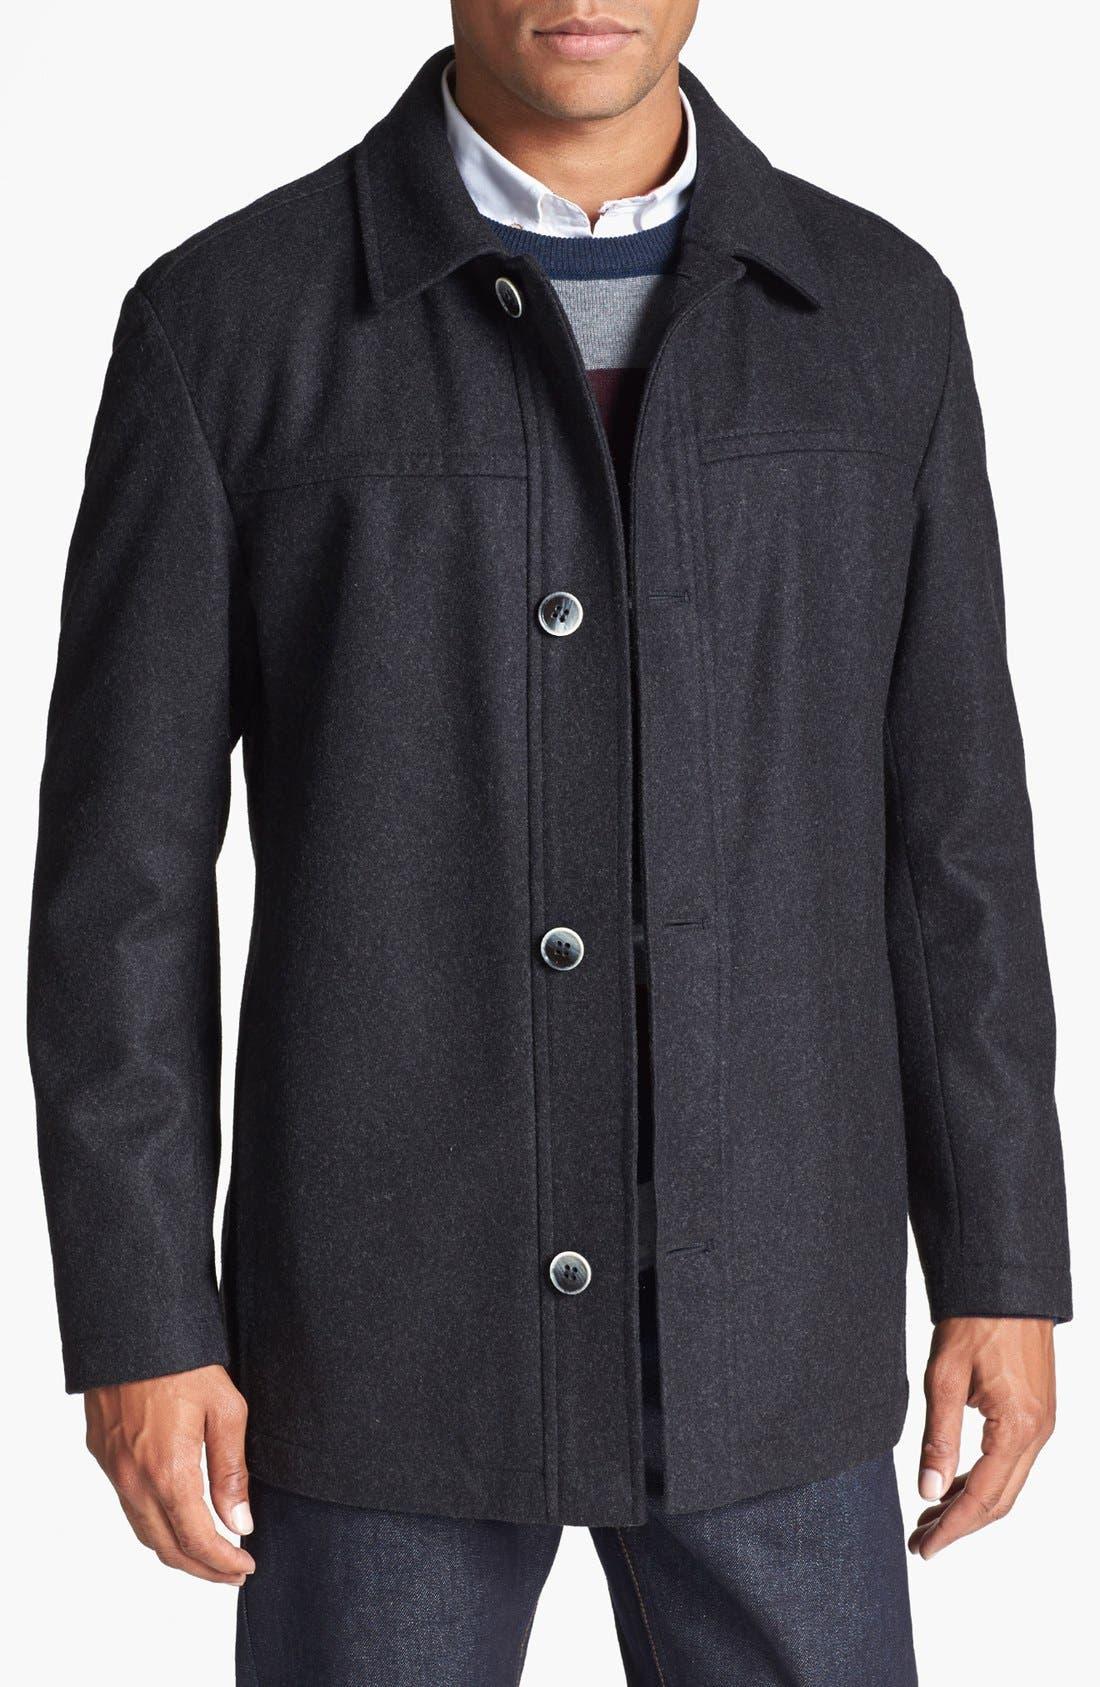 hugo boss \u0027chester\u0027 jacket1418460 Hugo Boss Tuxedo Shirt Nordstrom #18